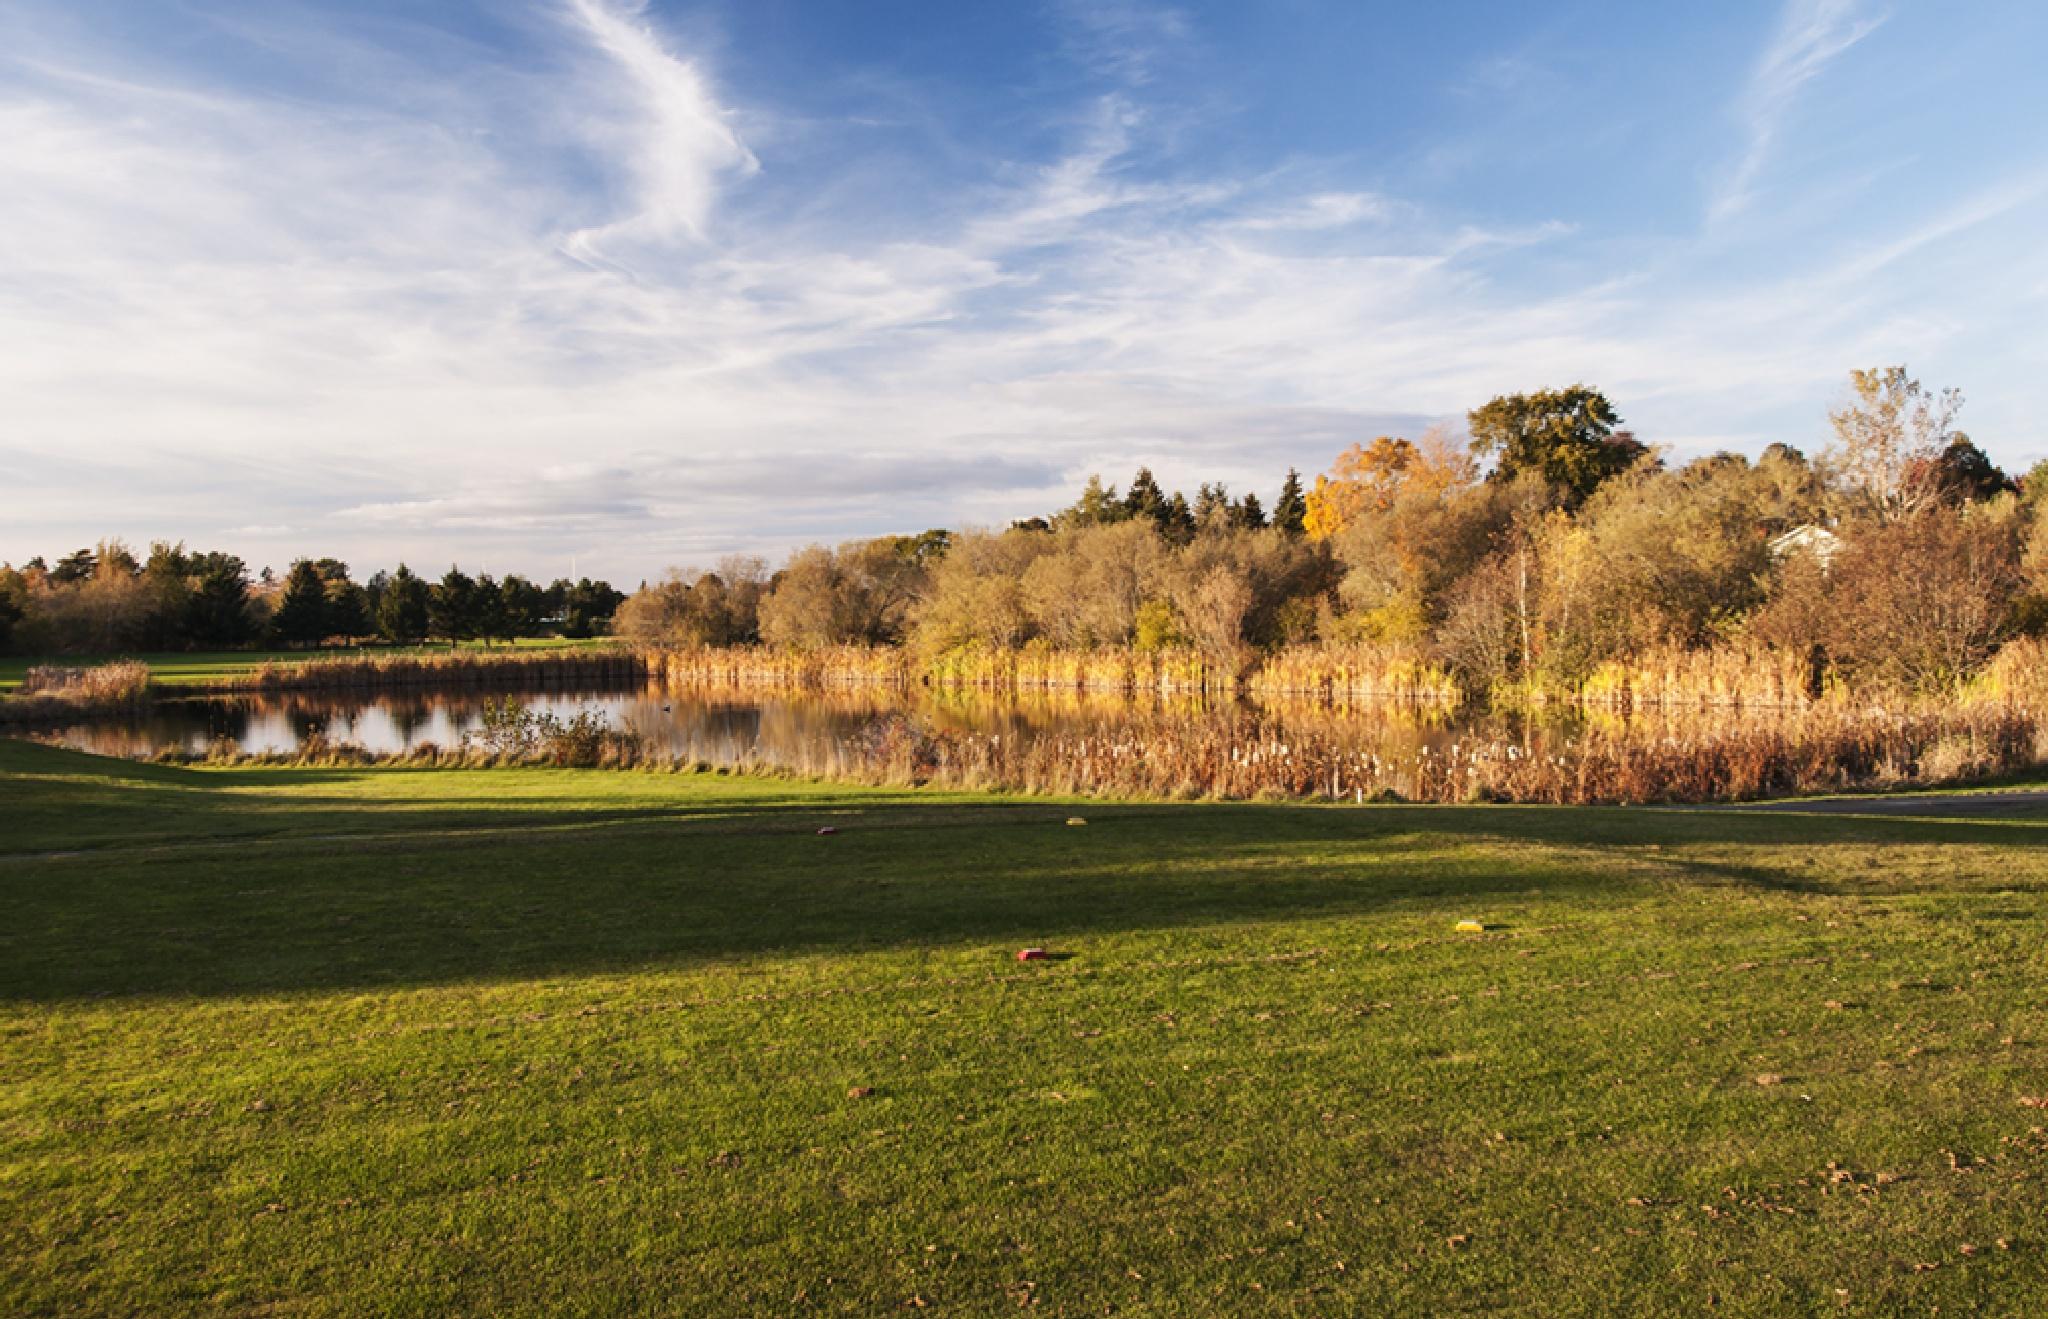 Sunlight on the Pond 3 by Wayne L. Talbot